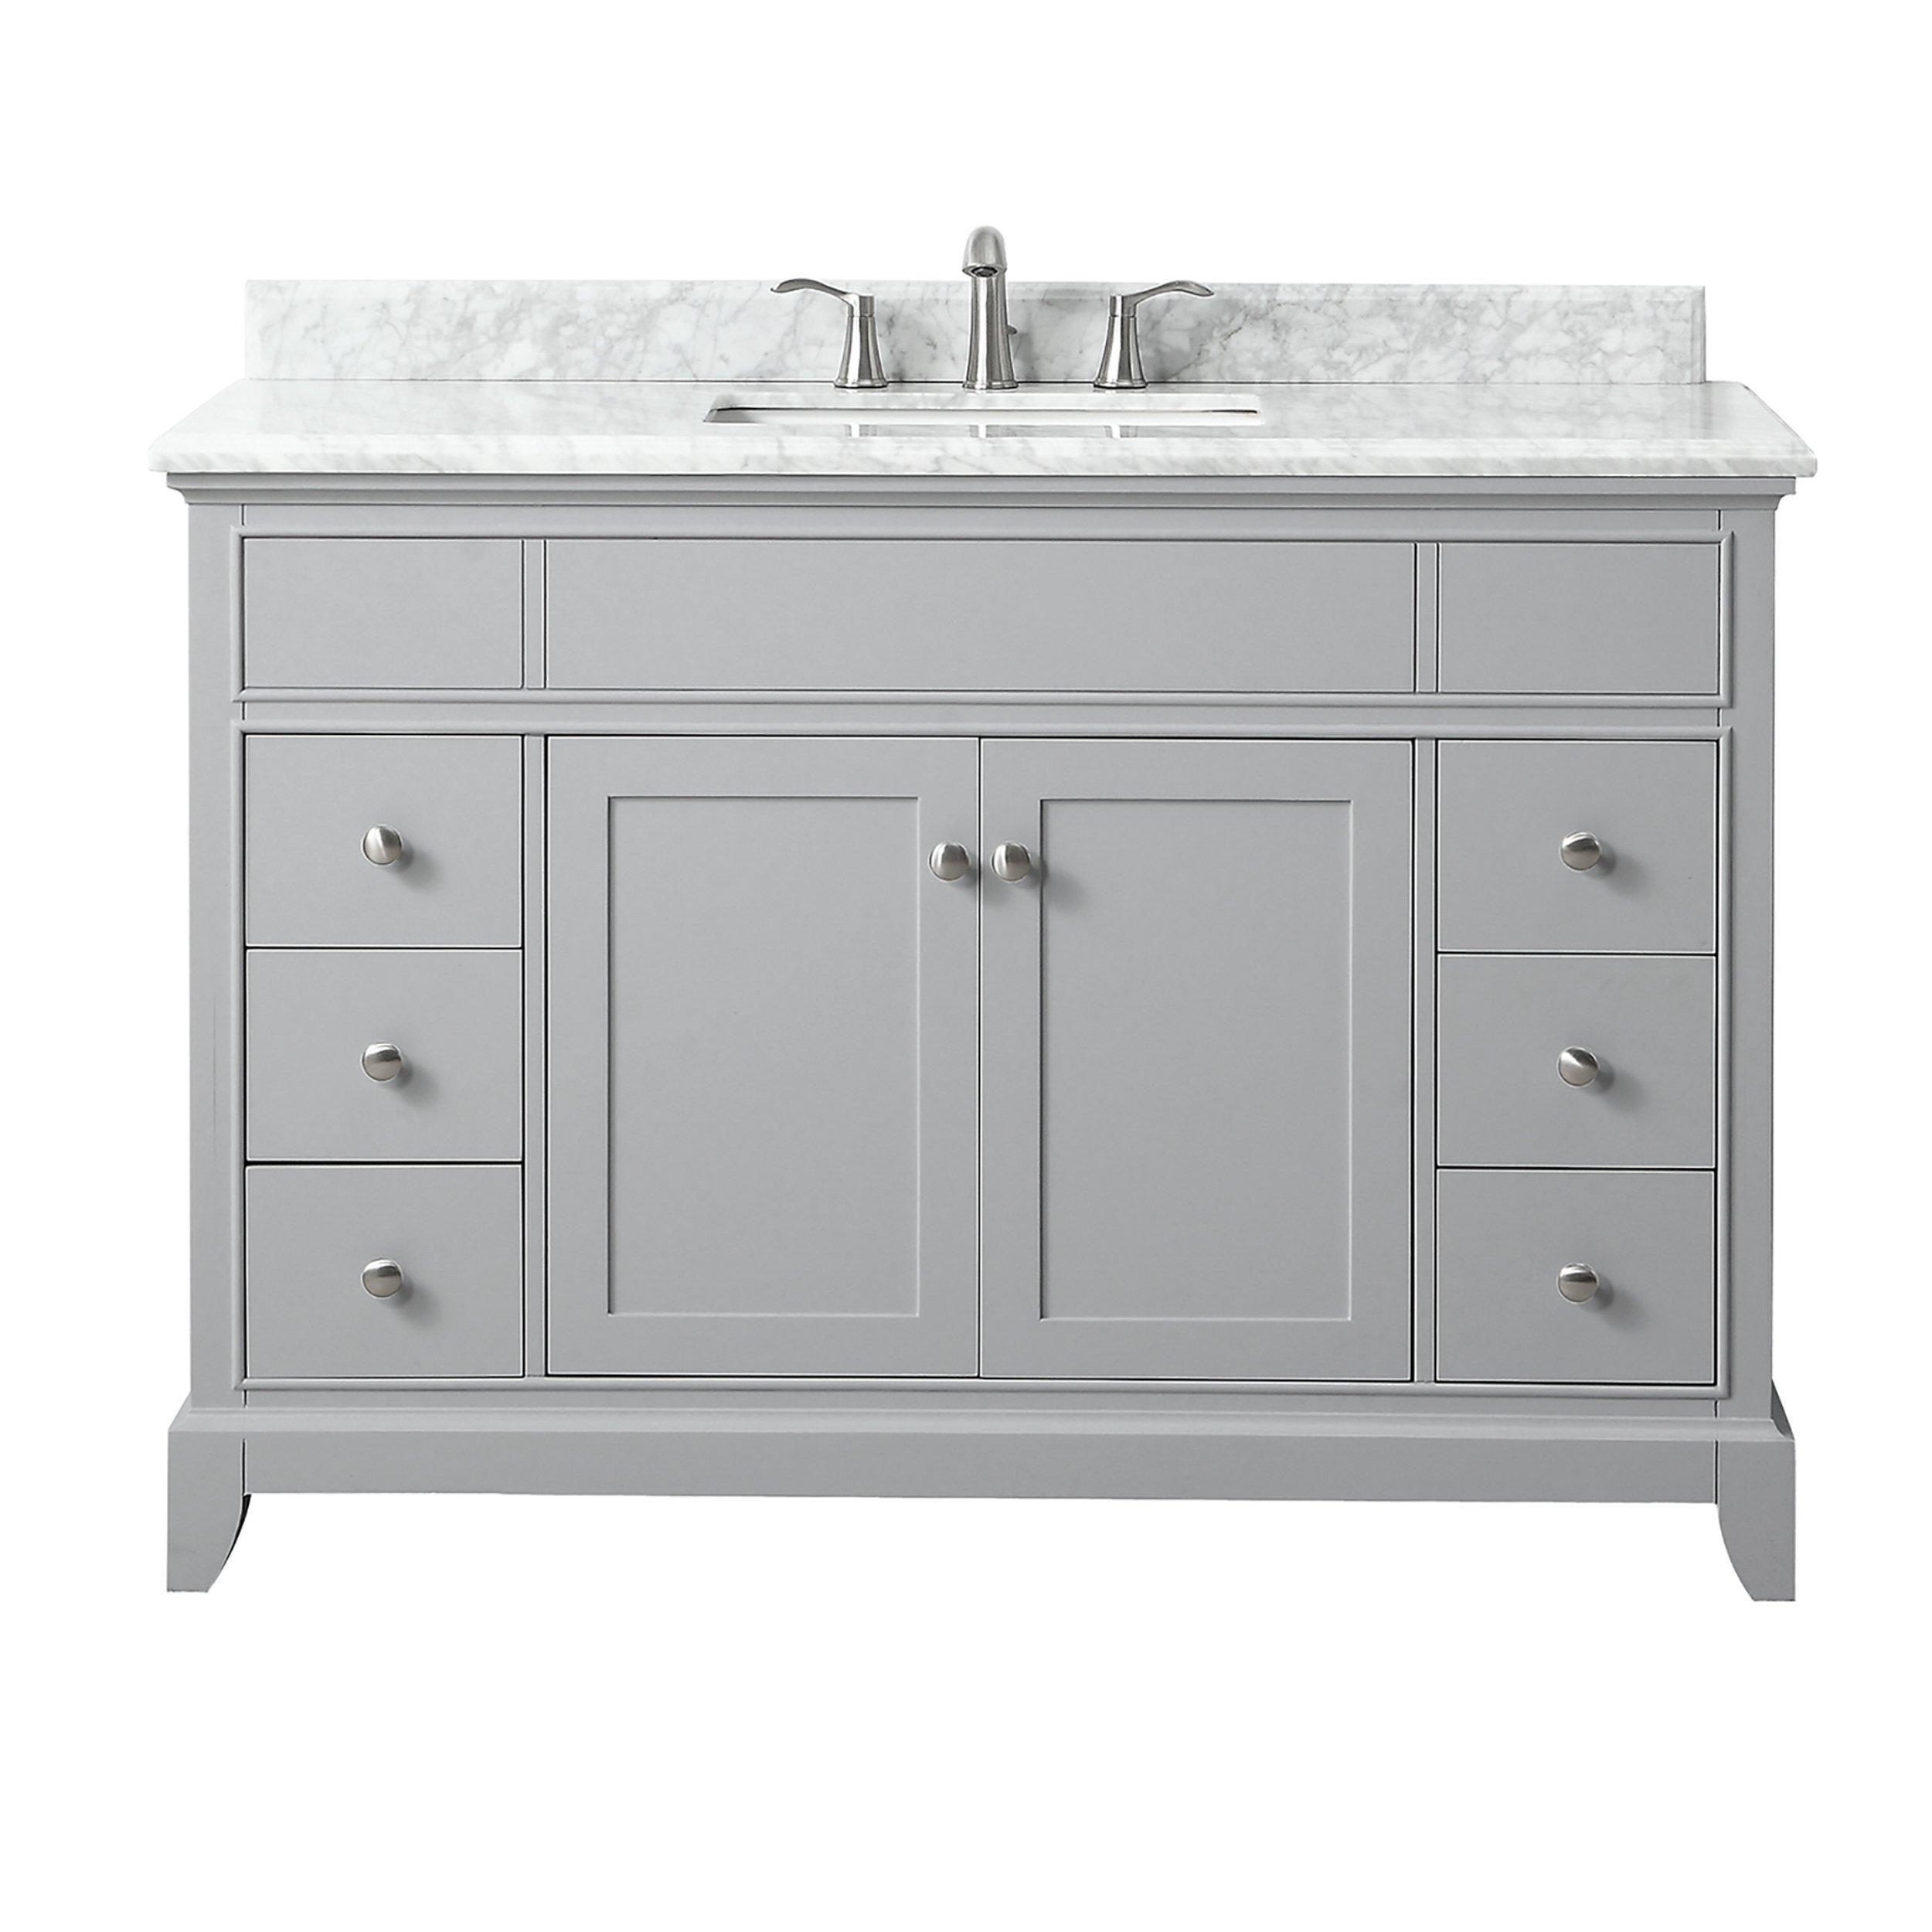 Aurora 49 In Vanity With Carrara Marble Top In 2021 Bathroom Vanity Single Bathroom Vanity Vanity